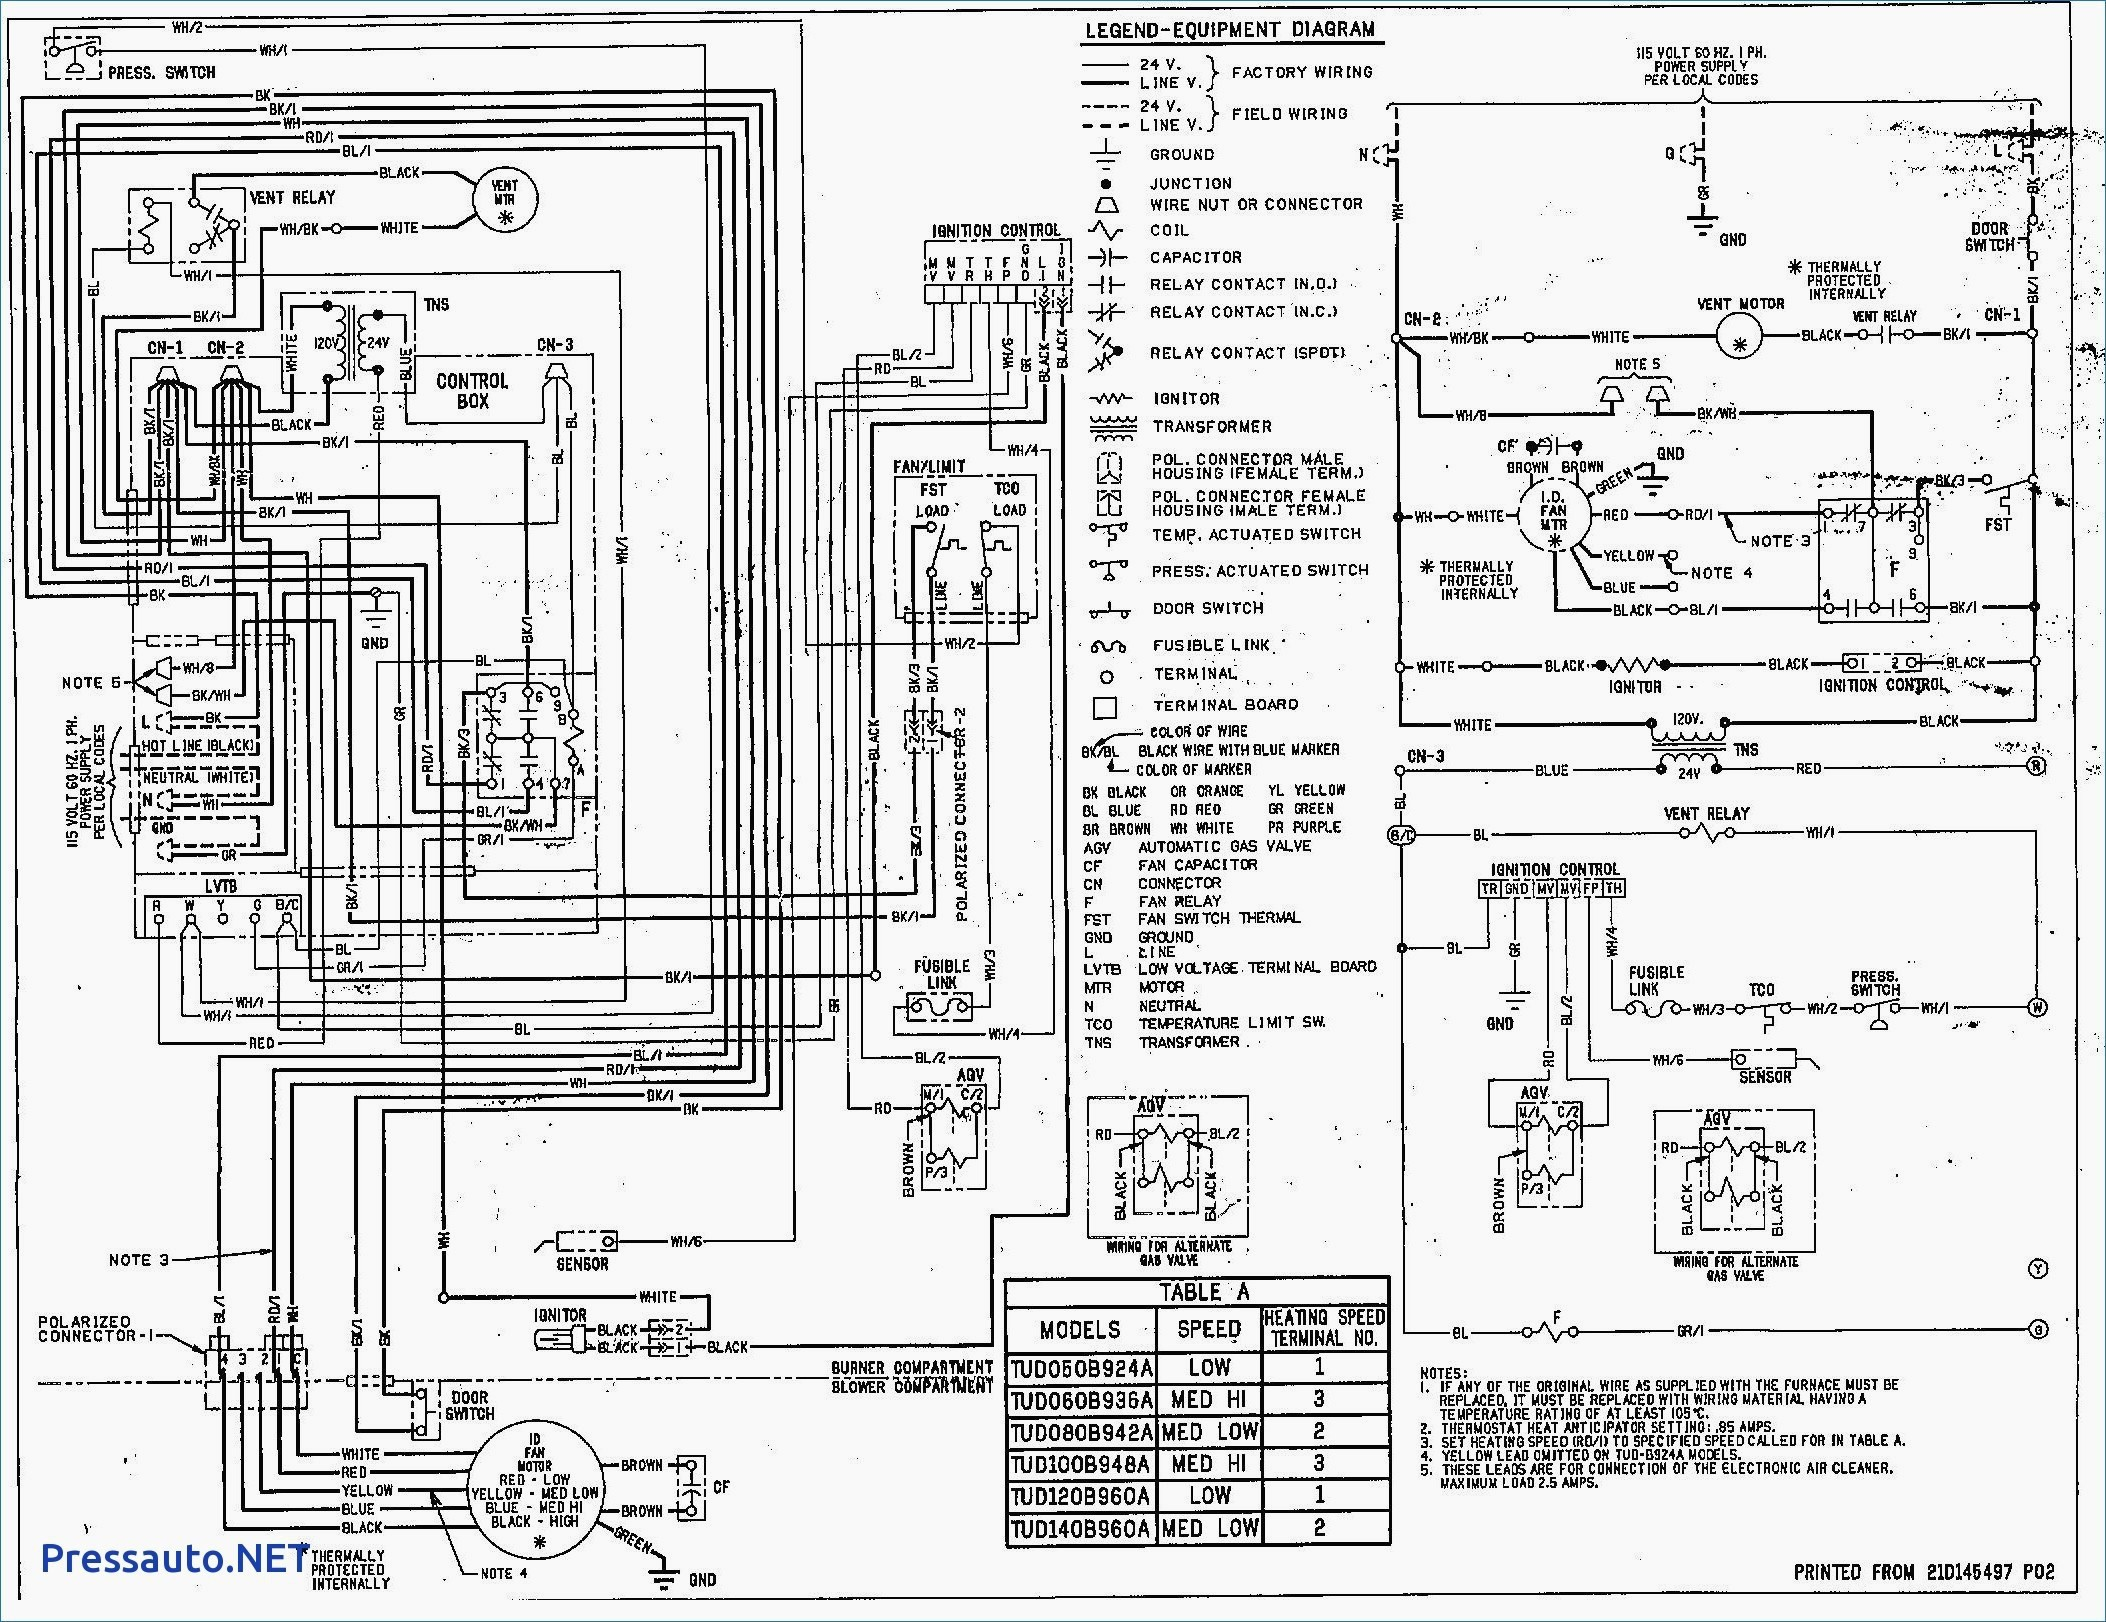 Wiring Diagram Alarm Mobil Raiton Trusted Diagrams Guide Circuit On